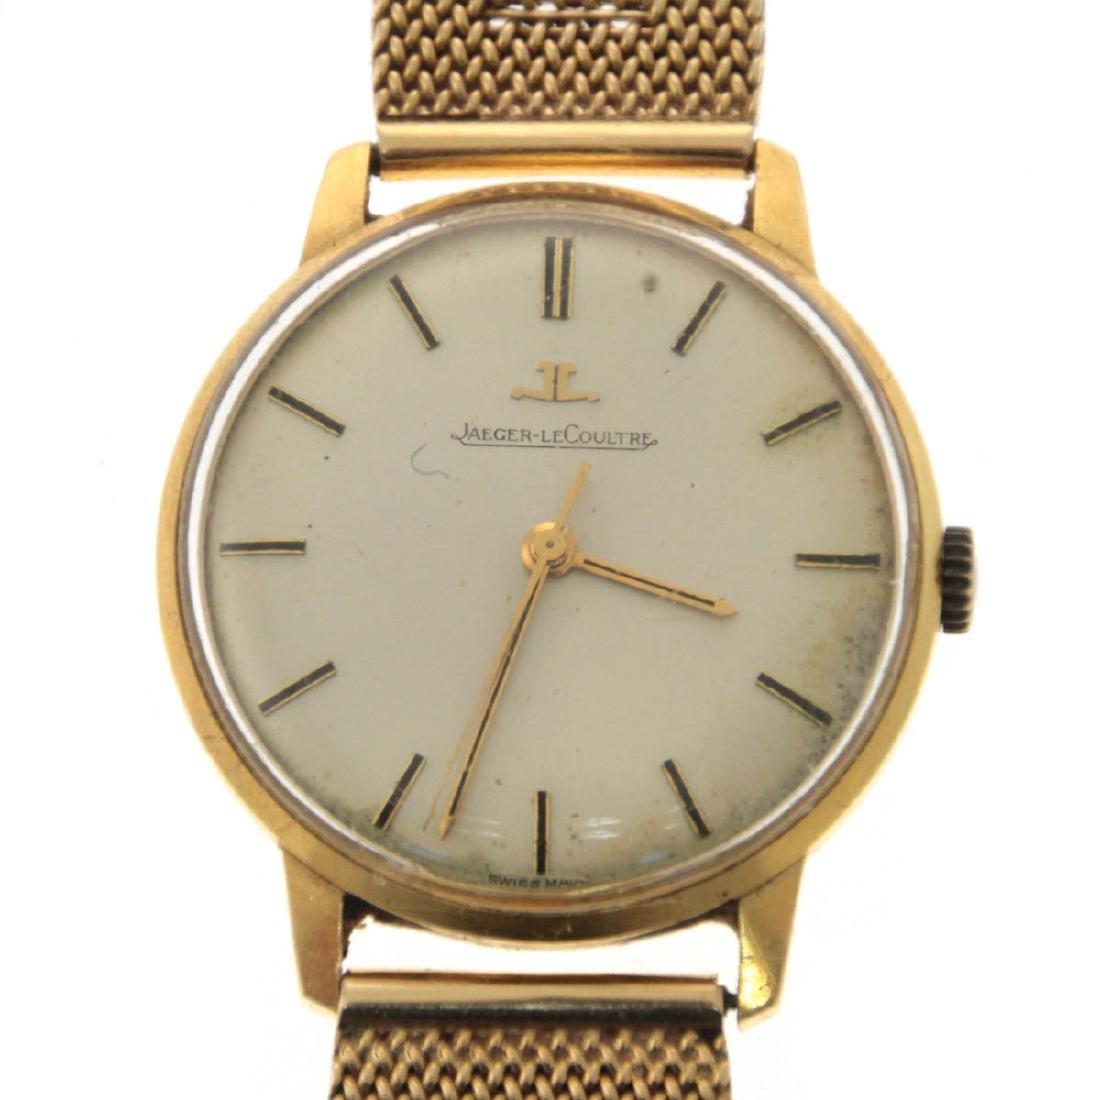 Jaeger Lecoultre 18k Yellow Gold Wrist Watch.